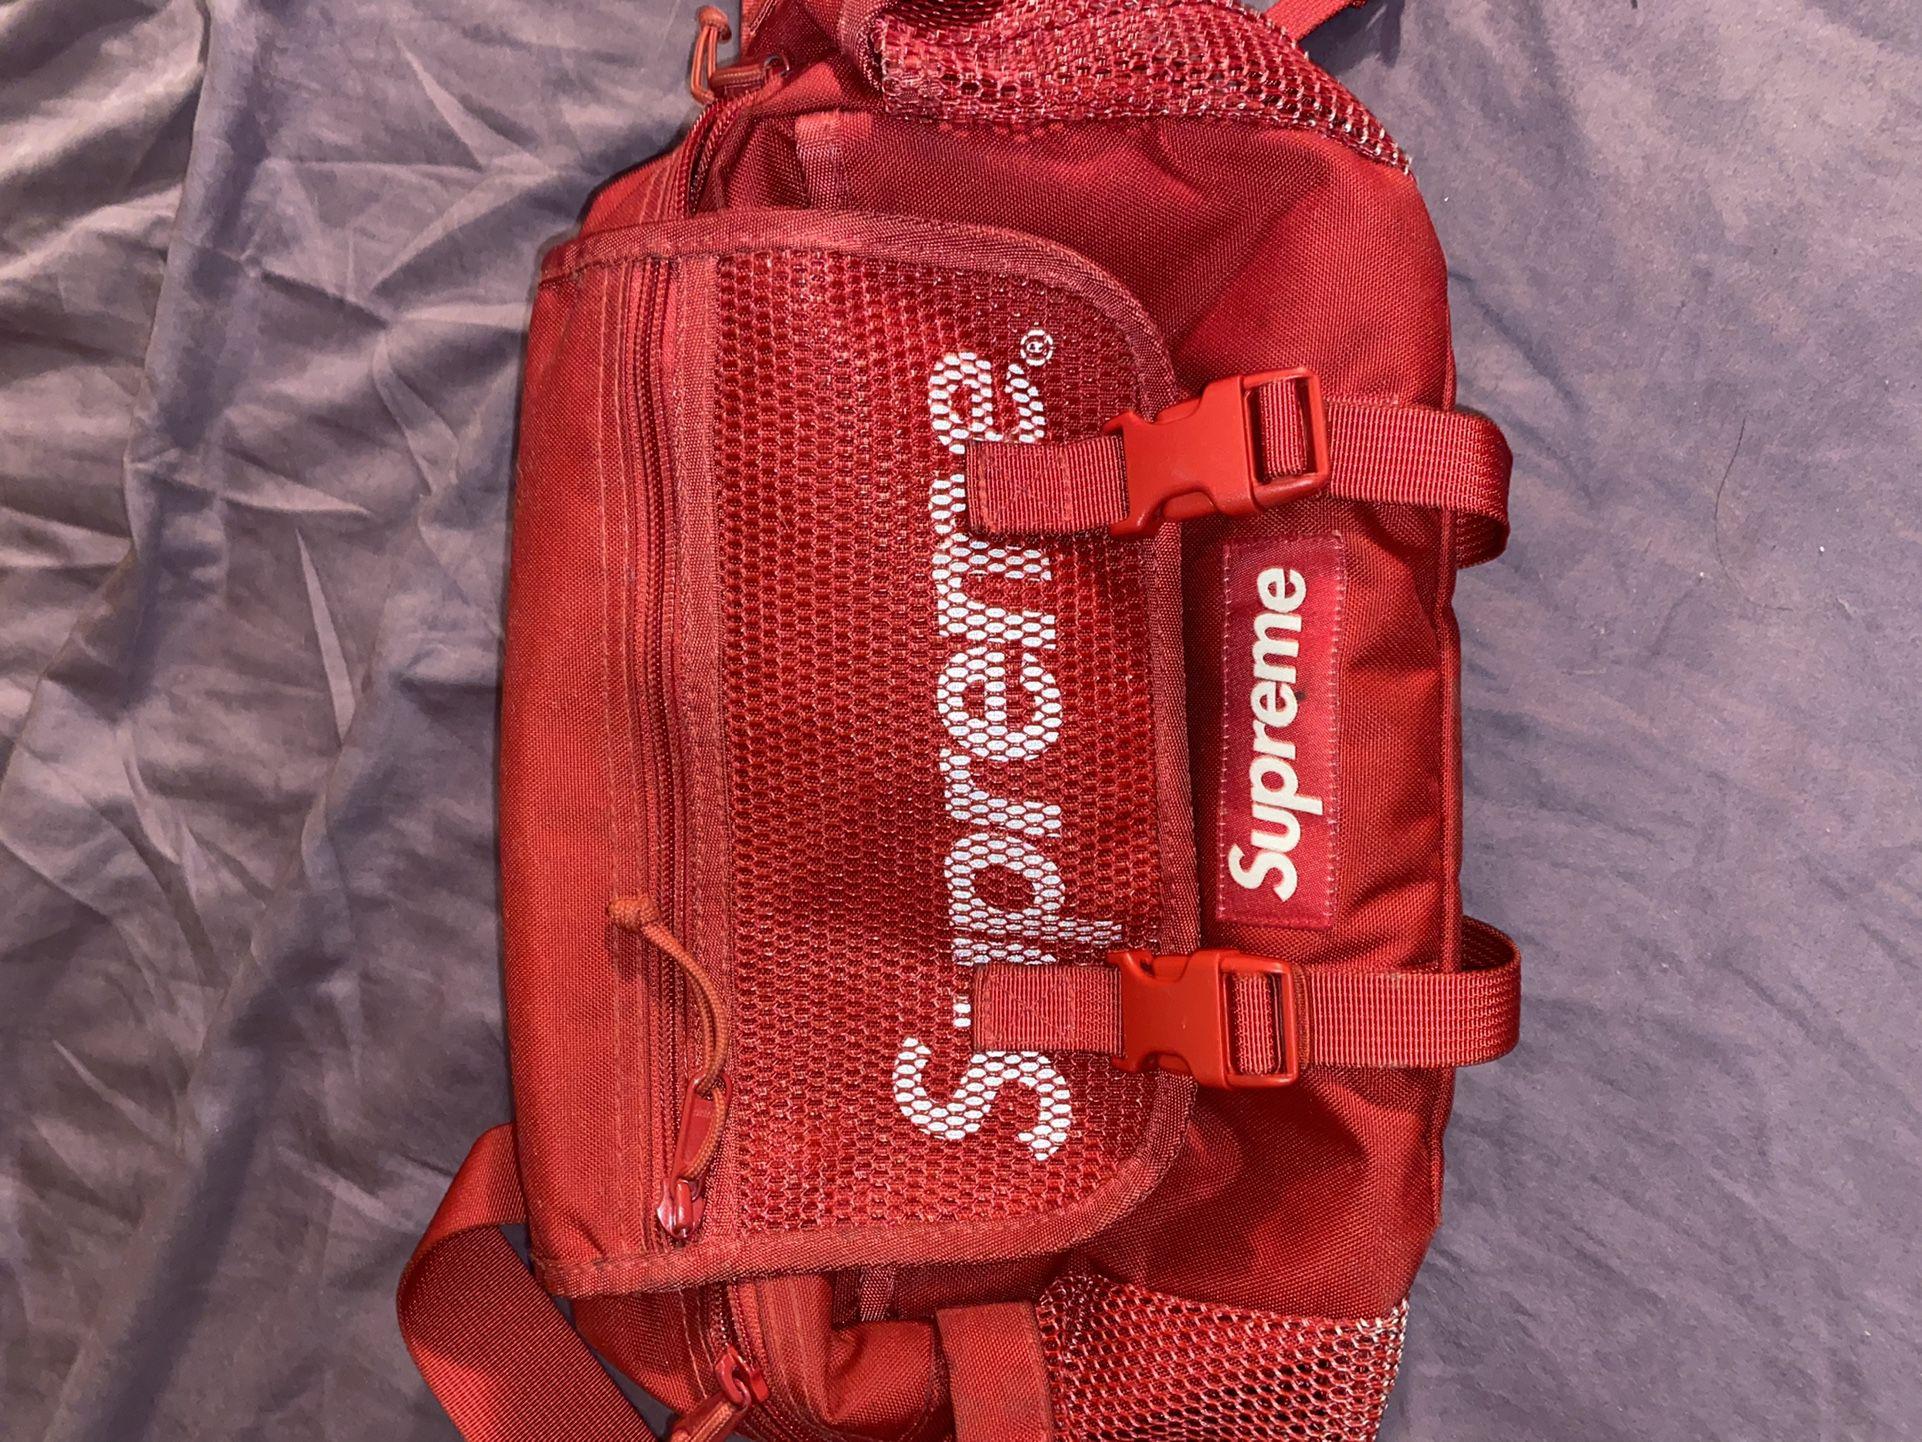 Authentic Supreme Bag!!